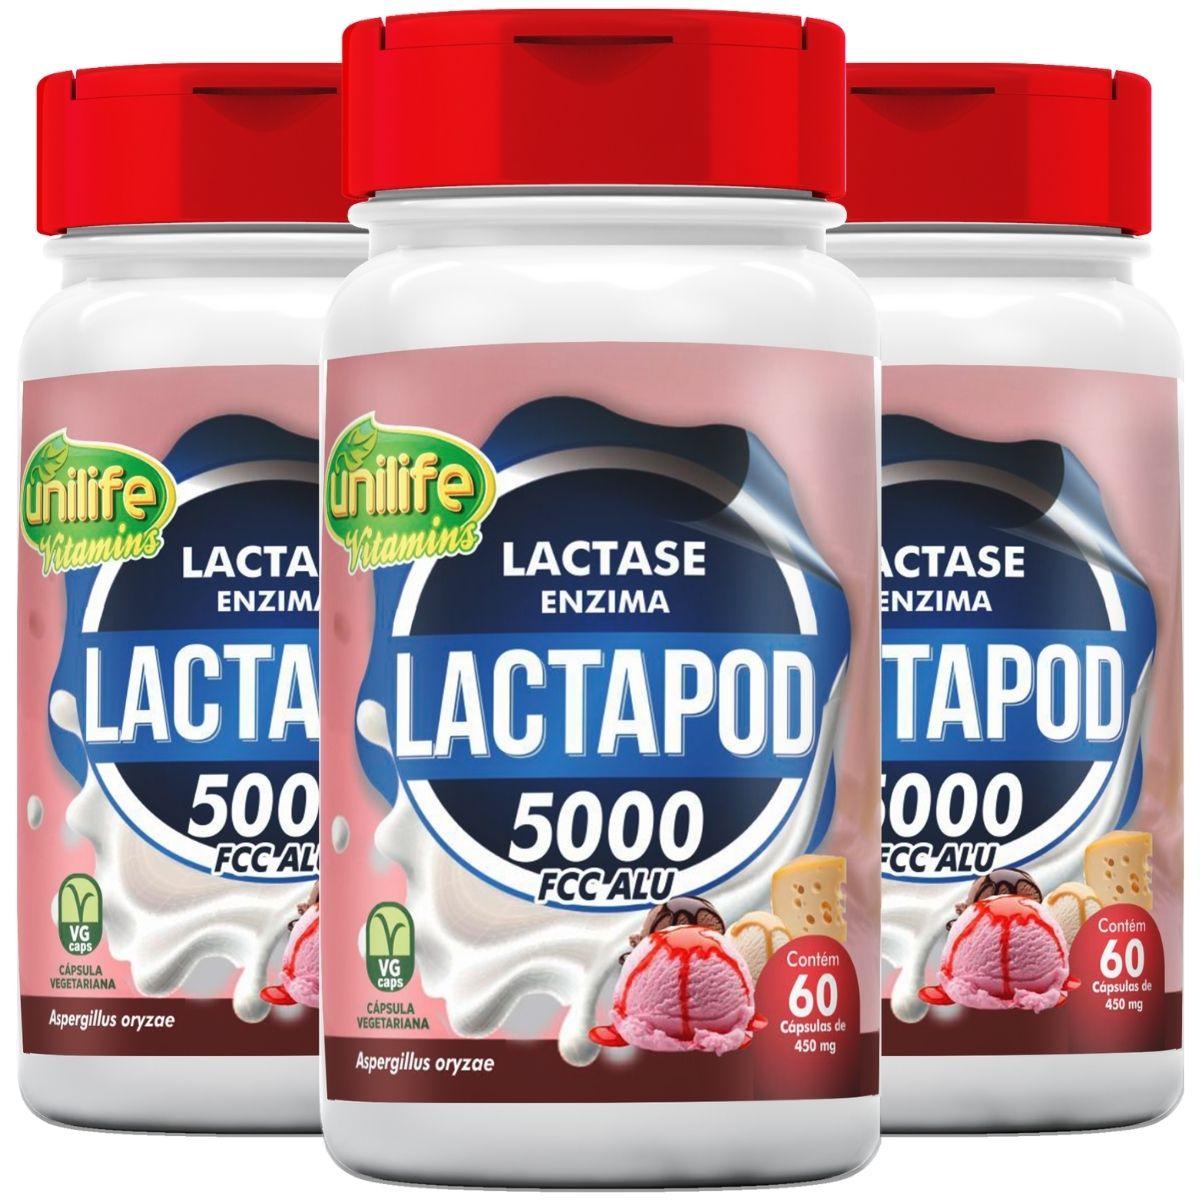 Kit 3 Lactase Lactapod Enzima 60 cápsulas 450mg - Unilife